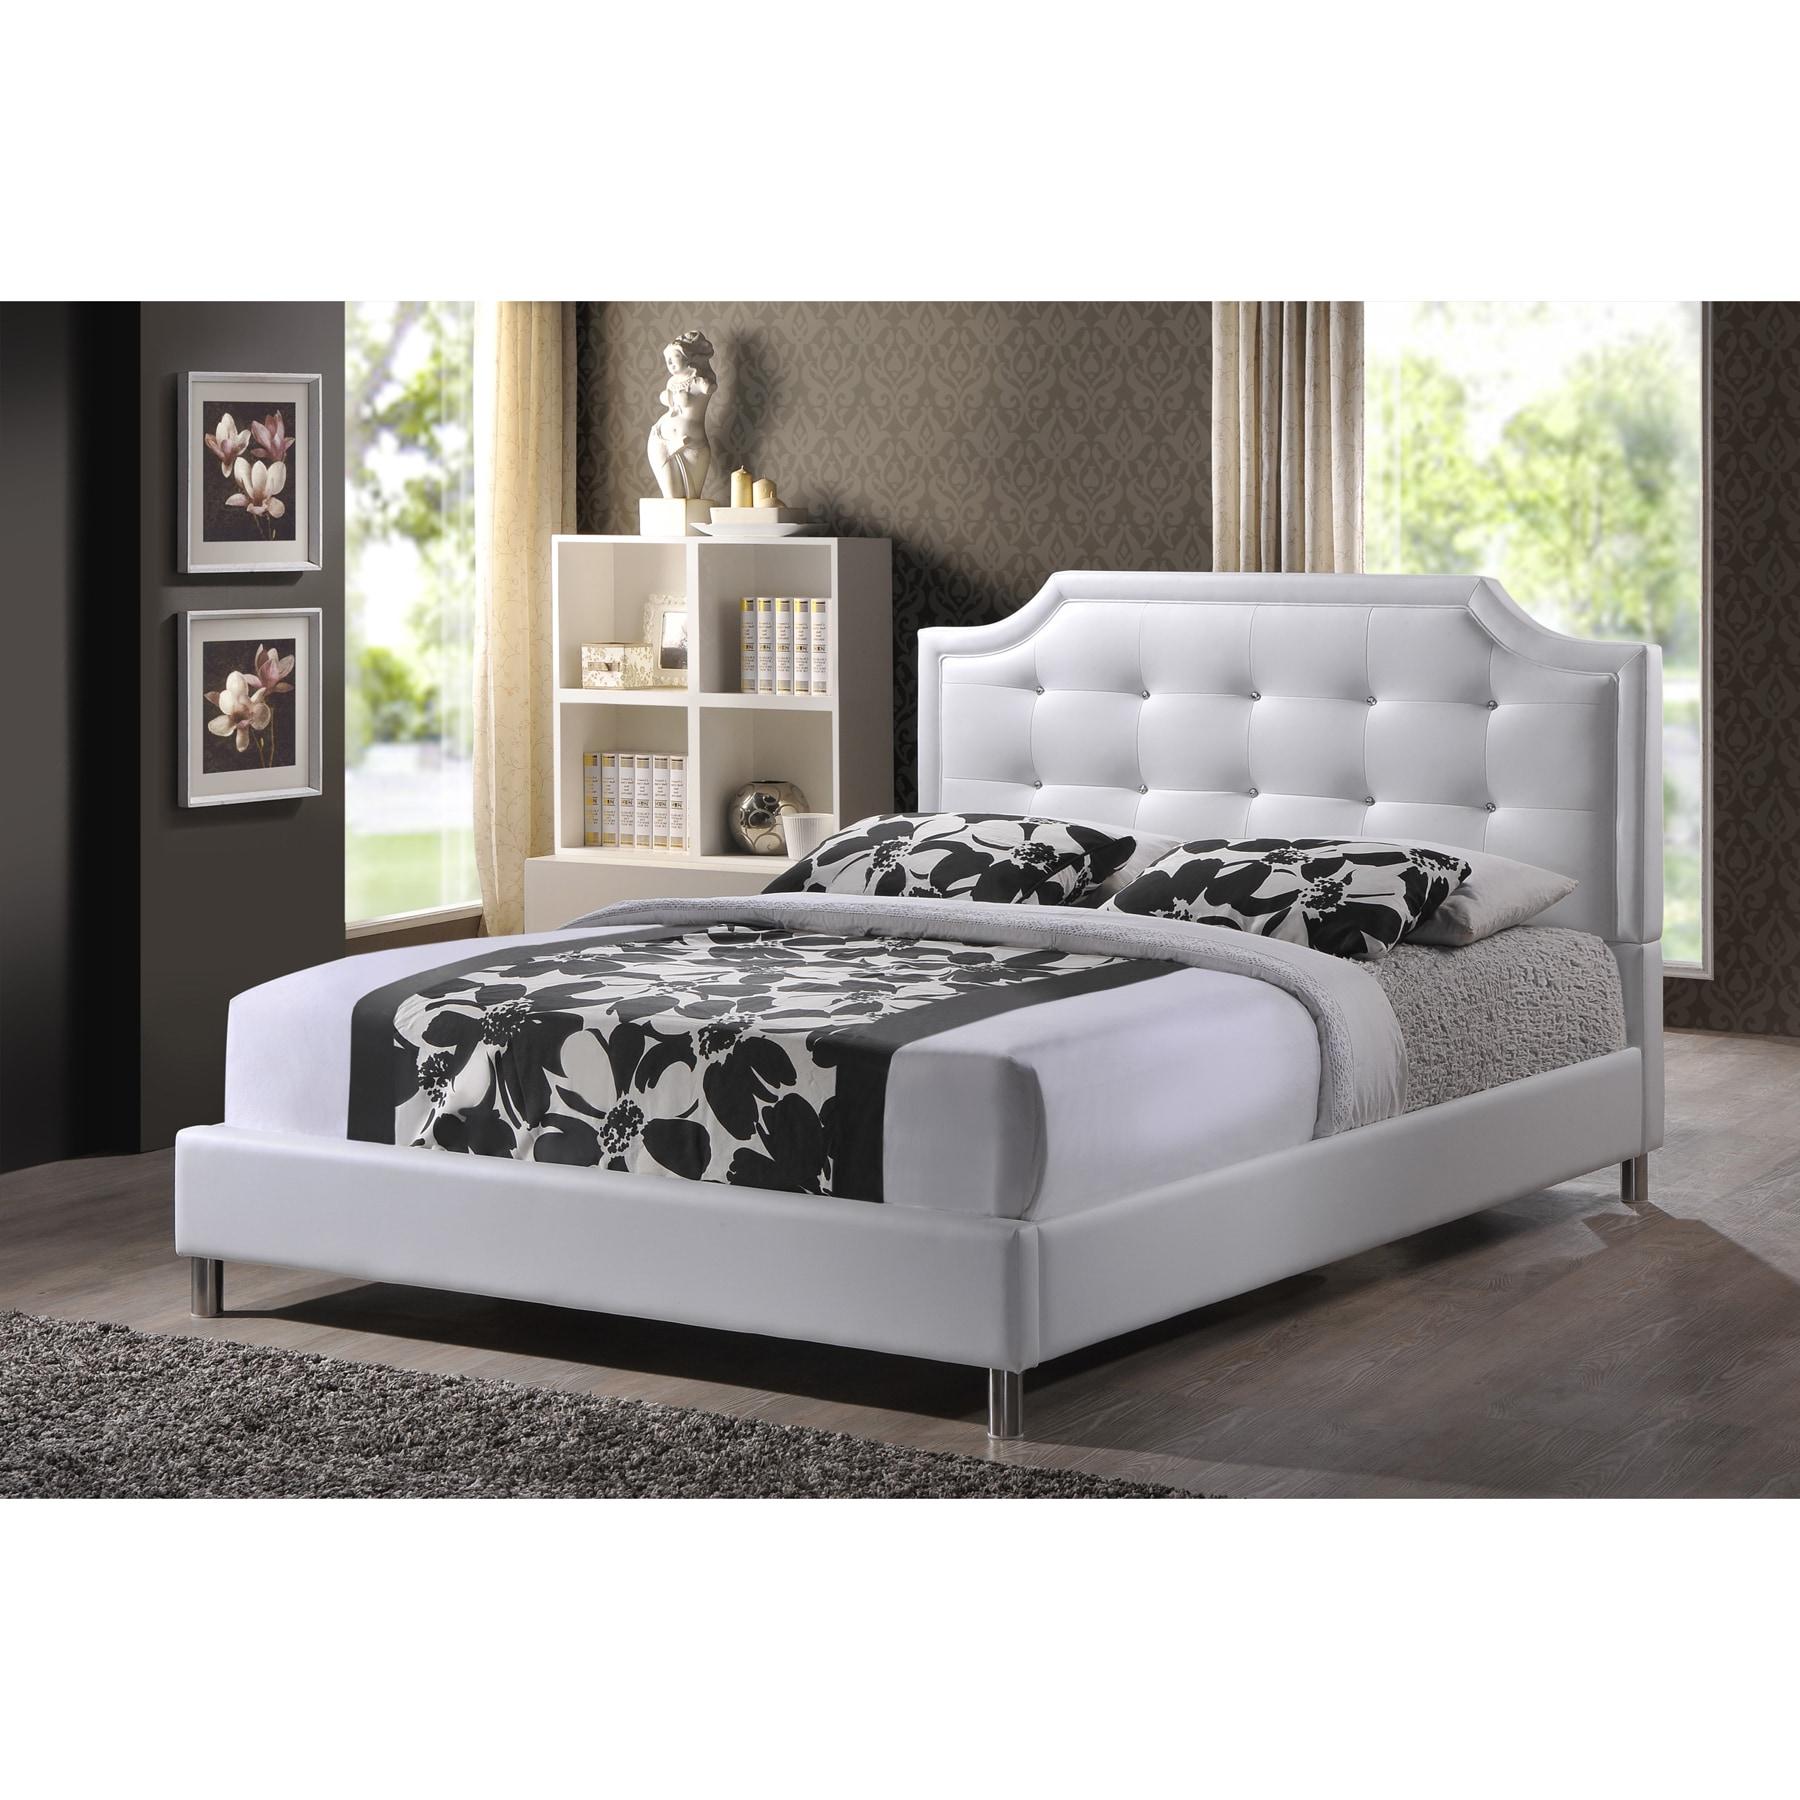 Modern White Headboard: Carlotta White Modern Bed With Upholstered Headboard